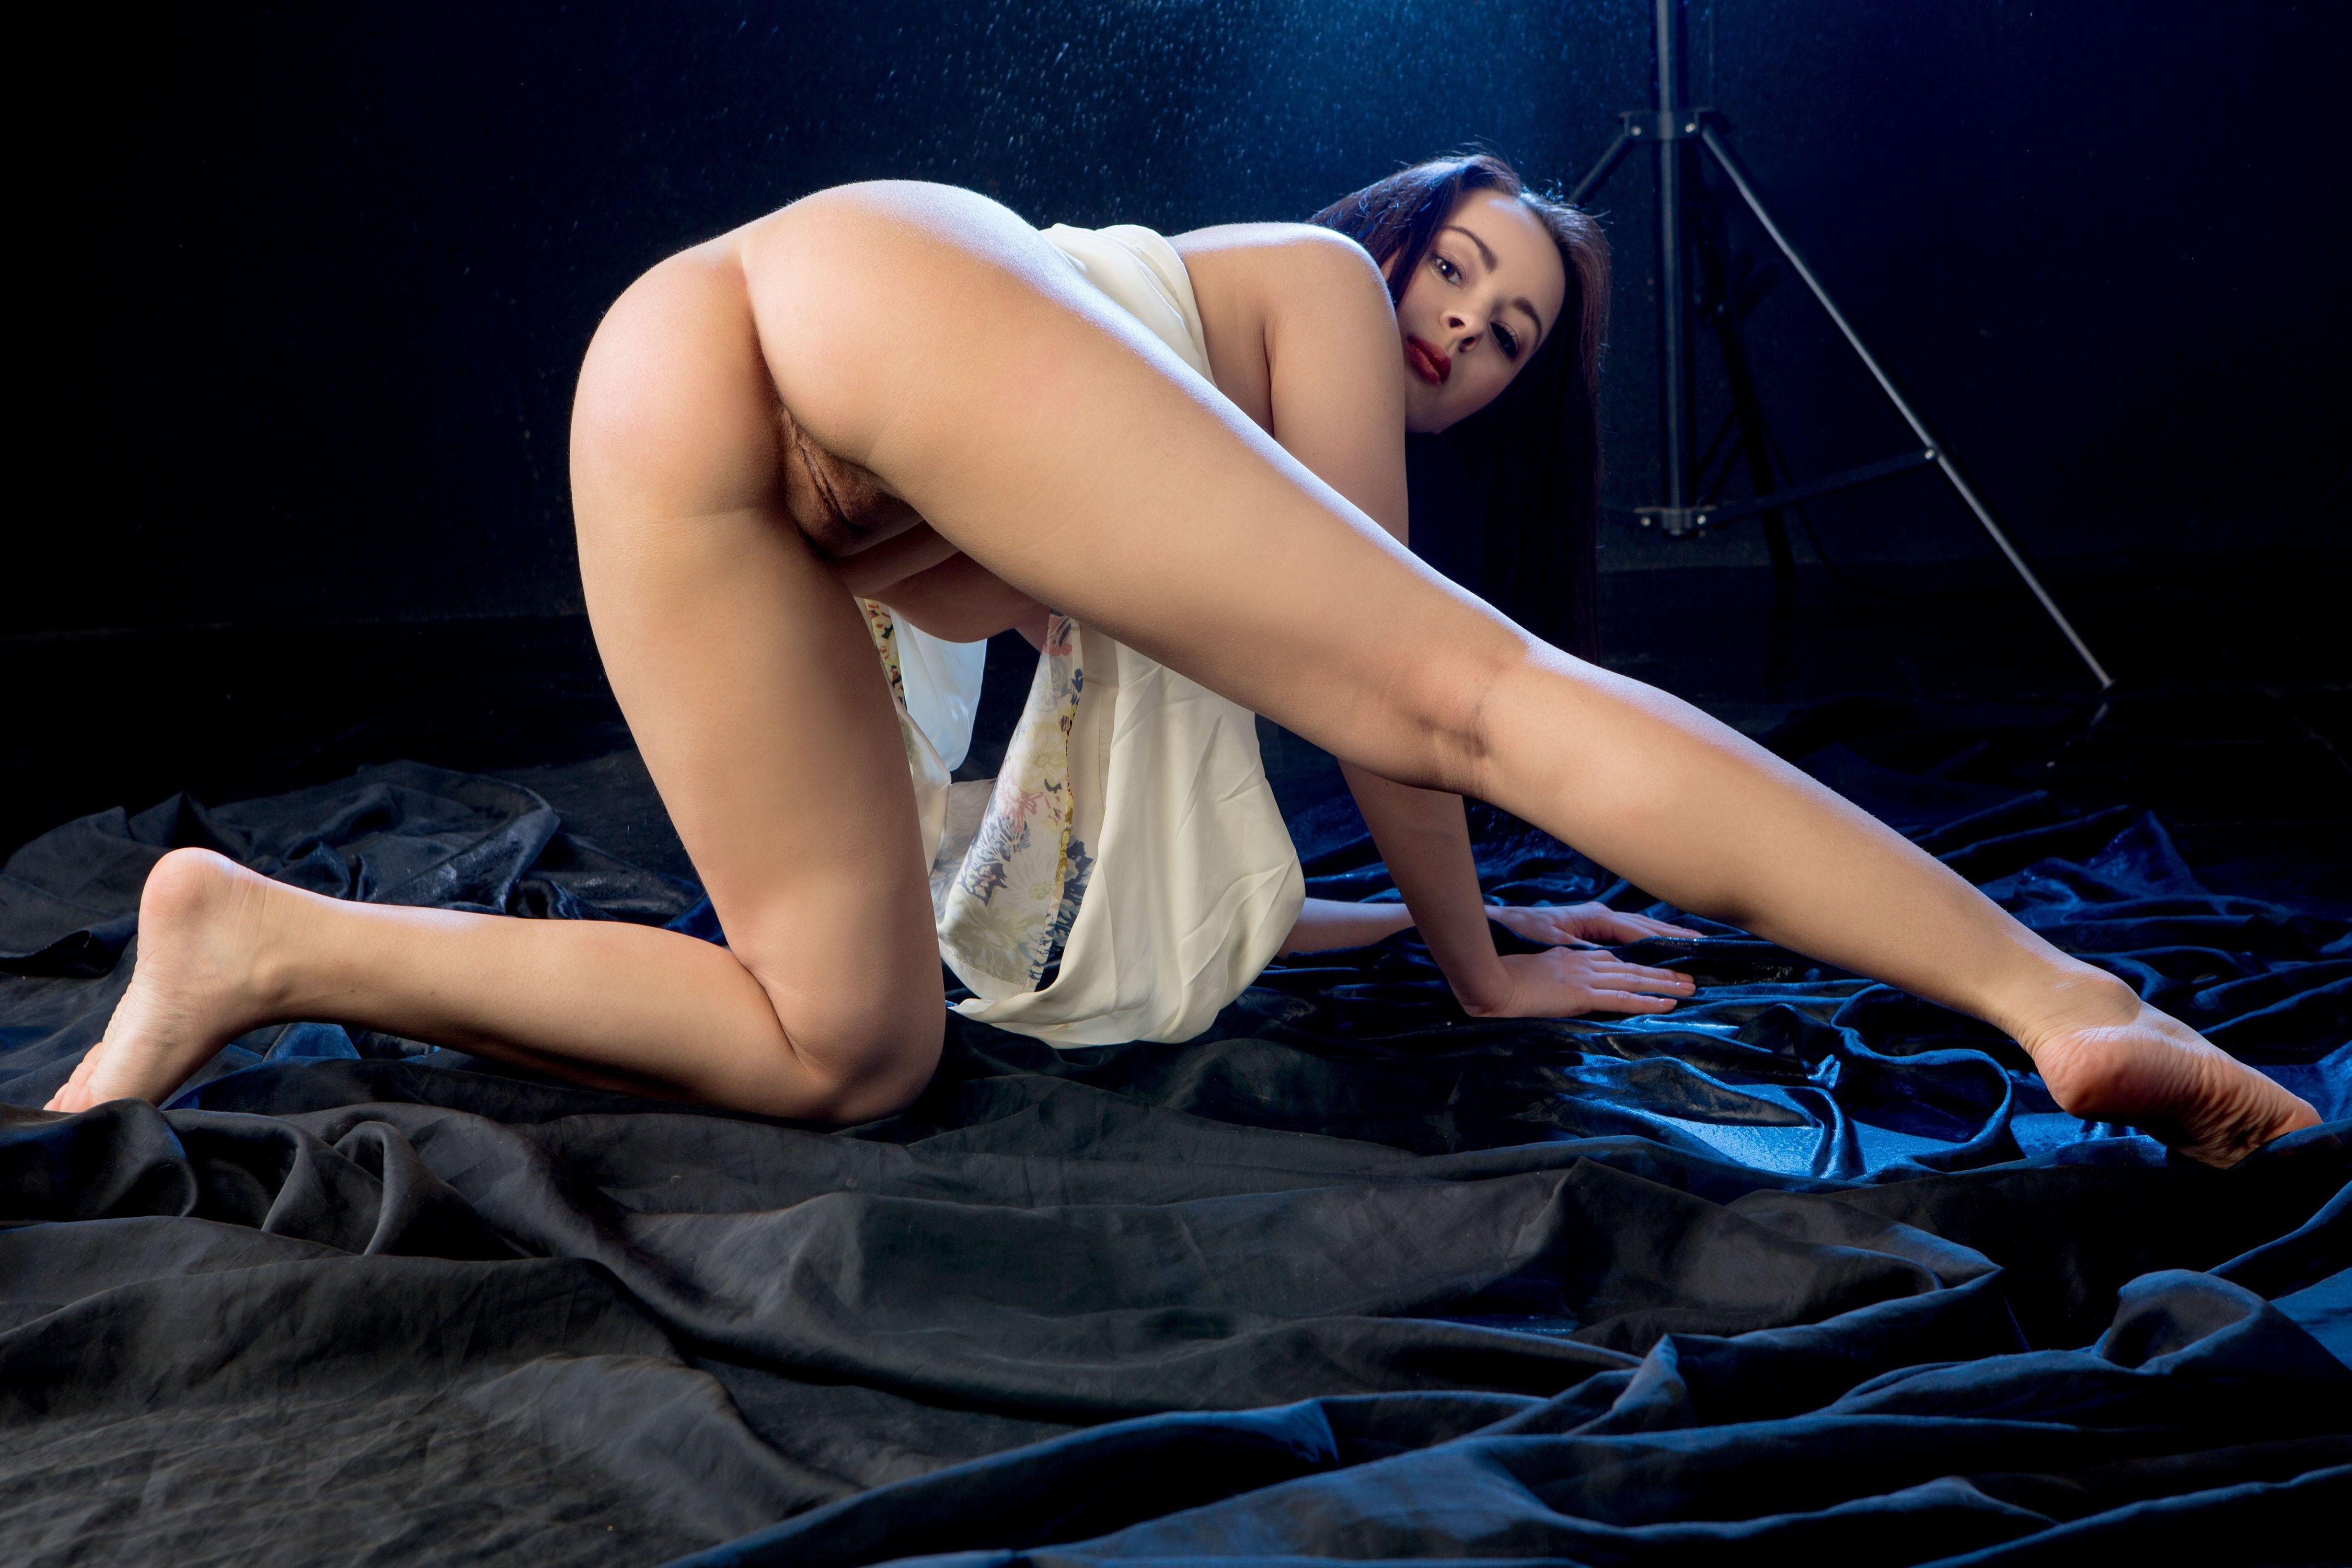 Fantasy photo art of filapina nudes